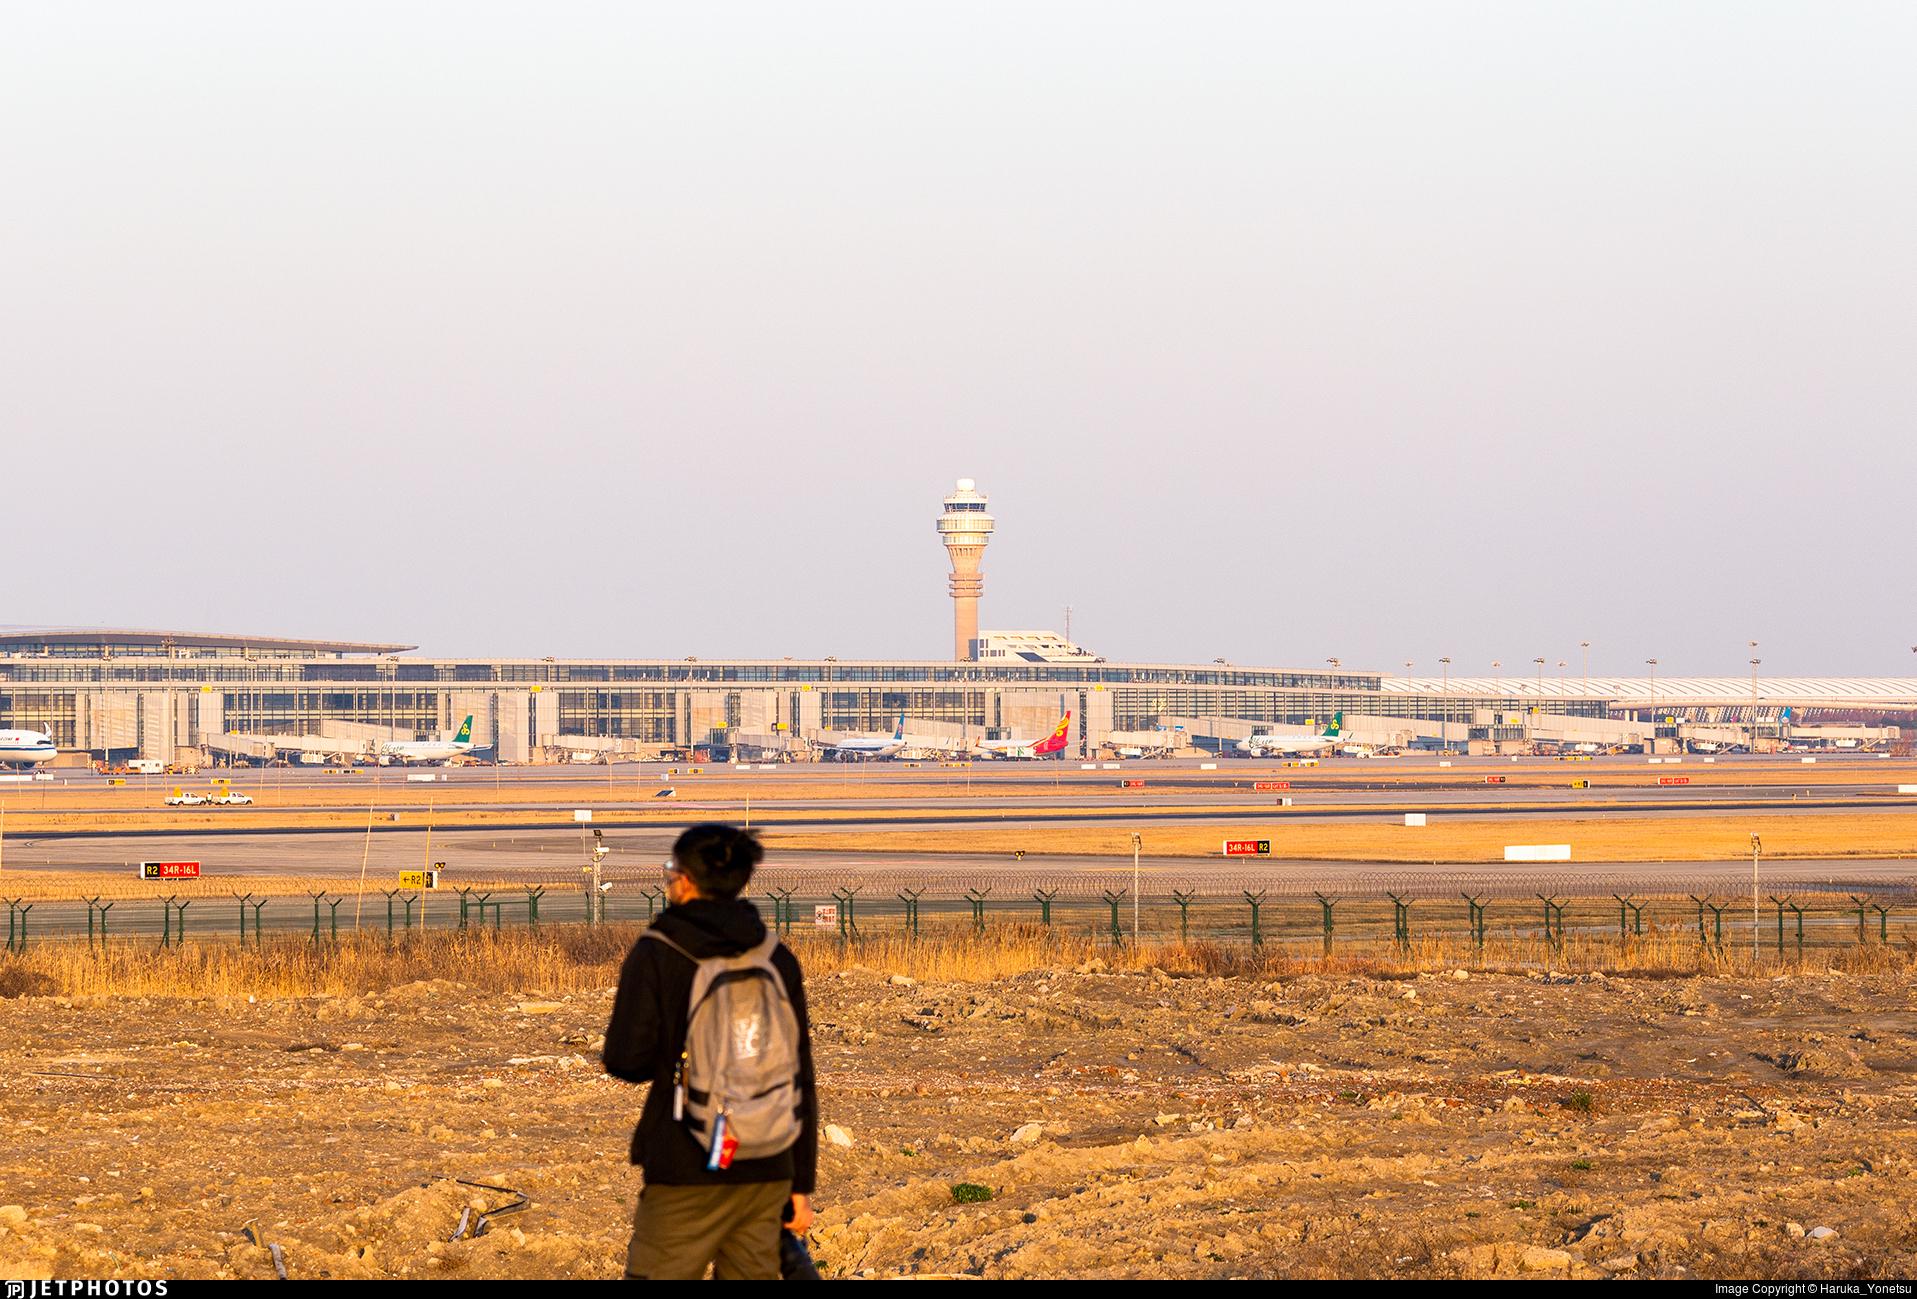 ZSPD - Airport - Spotting Location